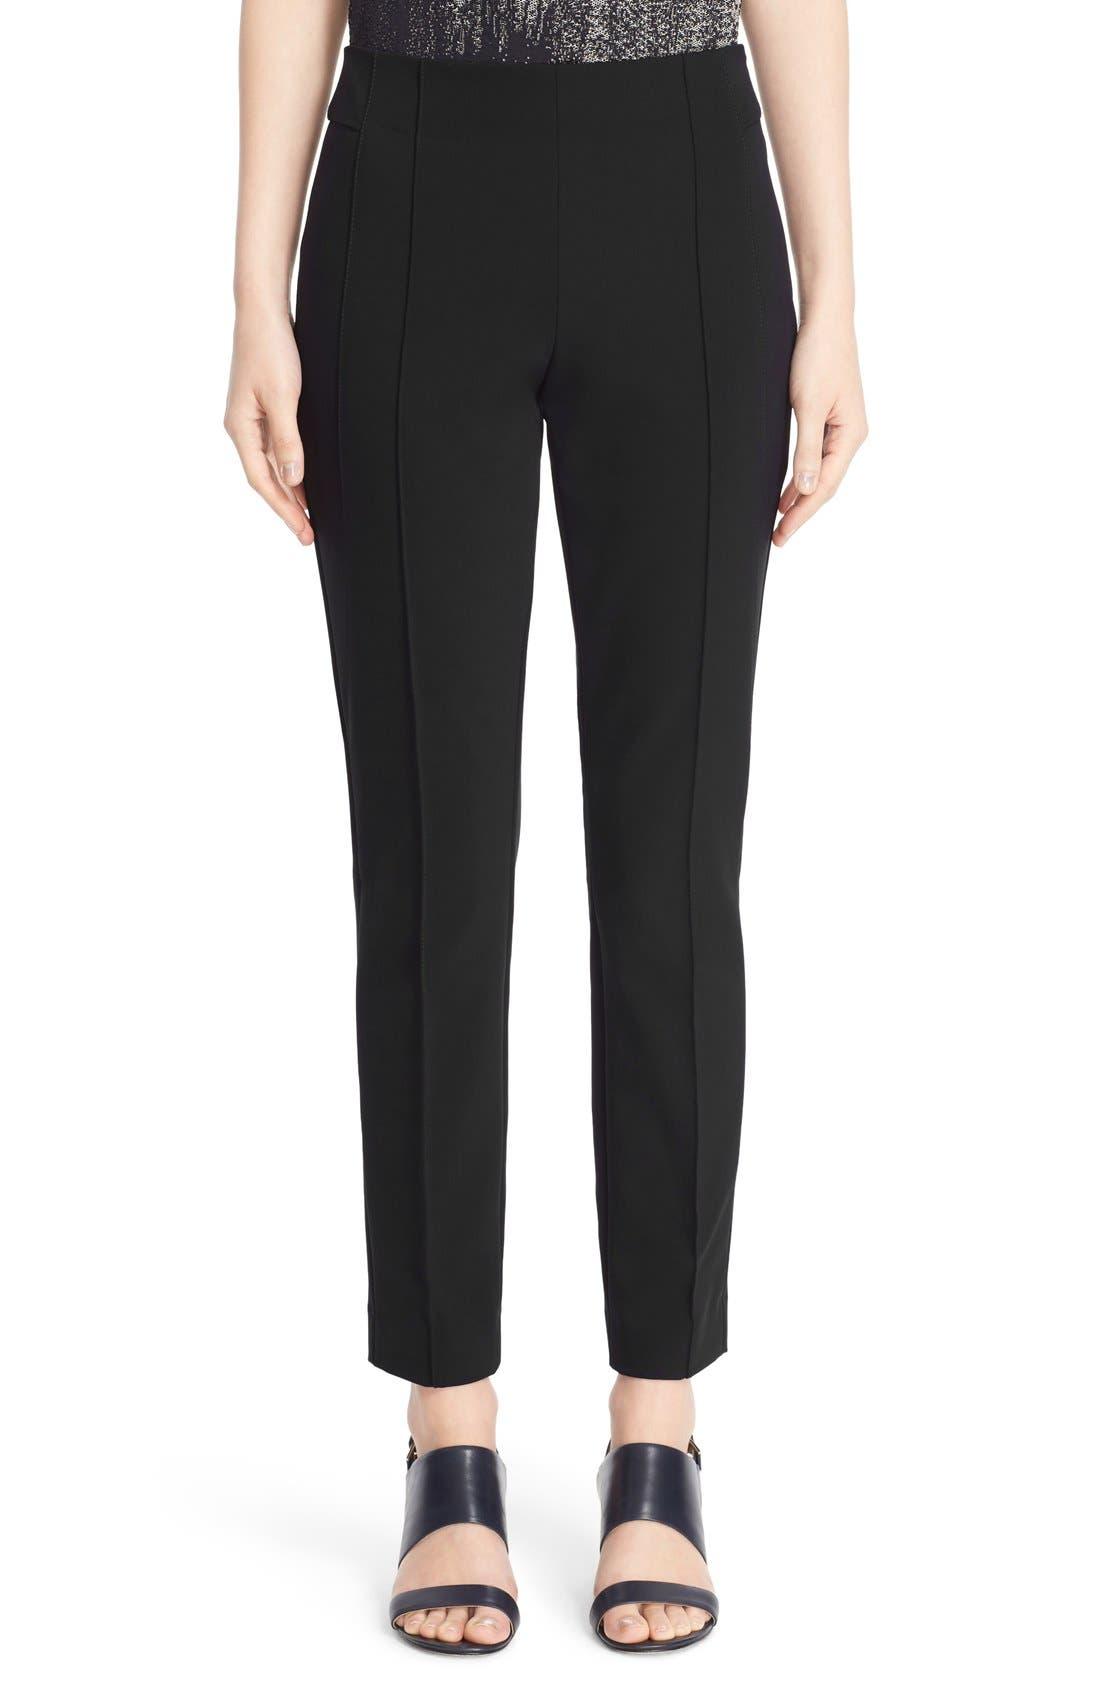 Women's Lafayette 148 New York 'Gramercy' Acclaimed Stretch Pants,  10 - Black